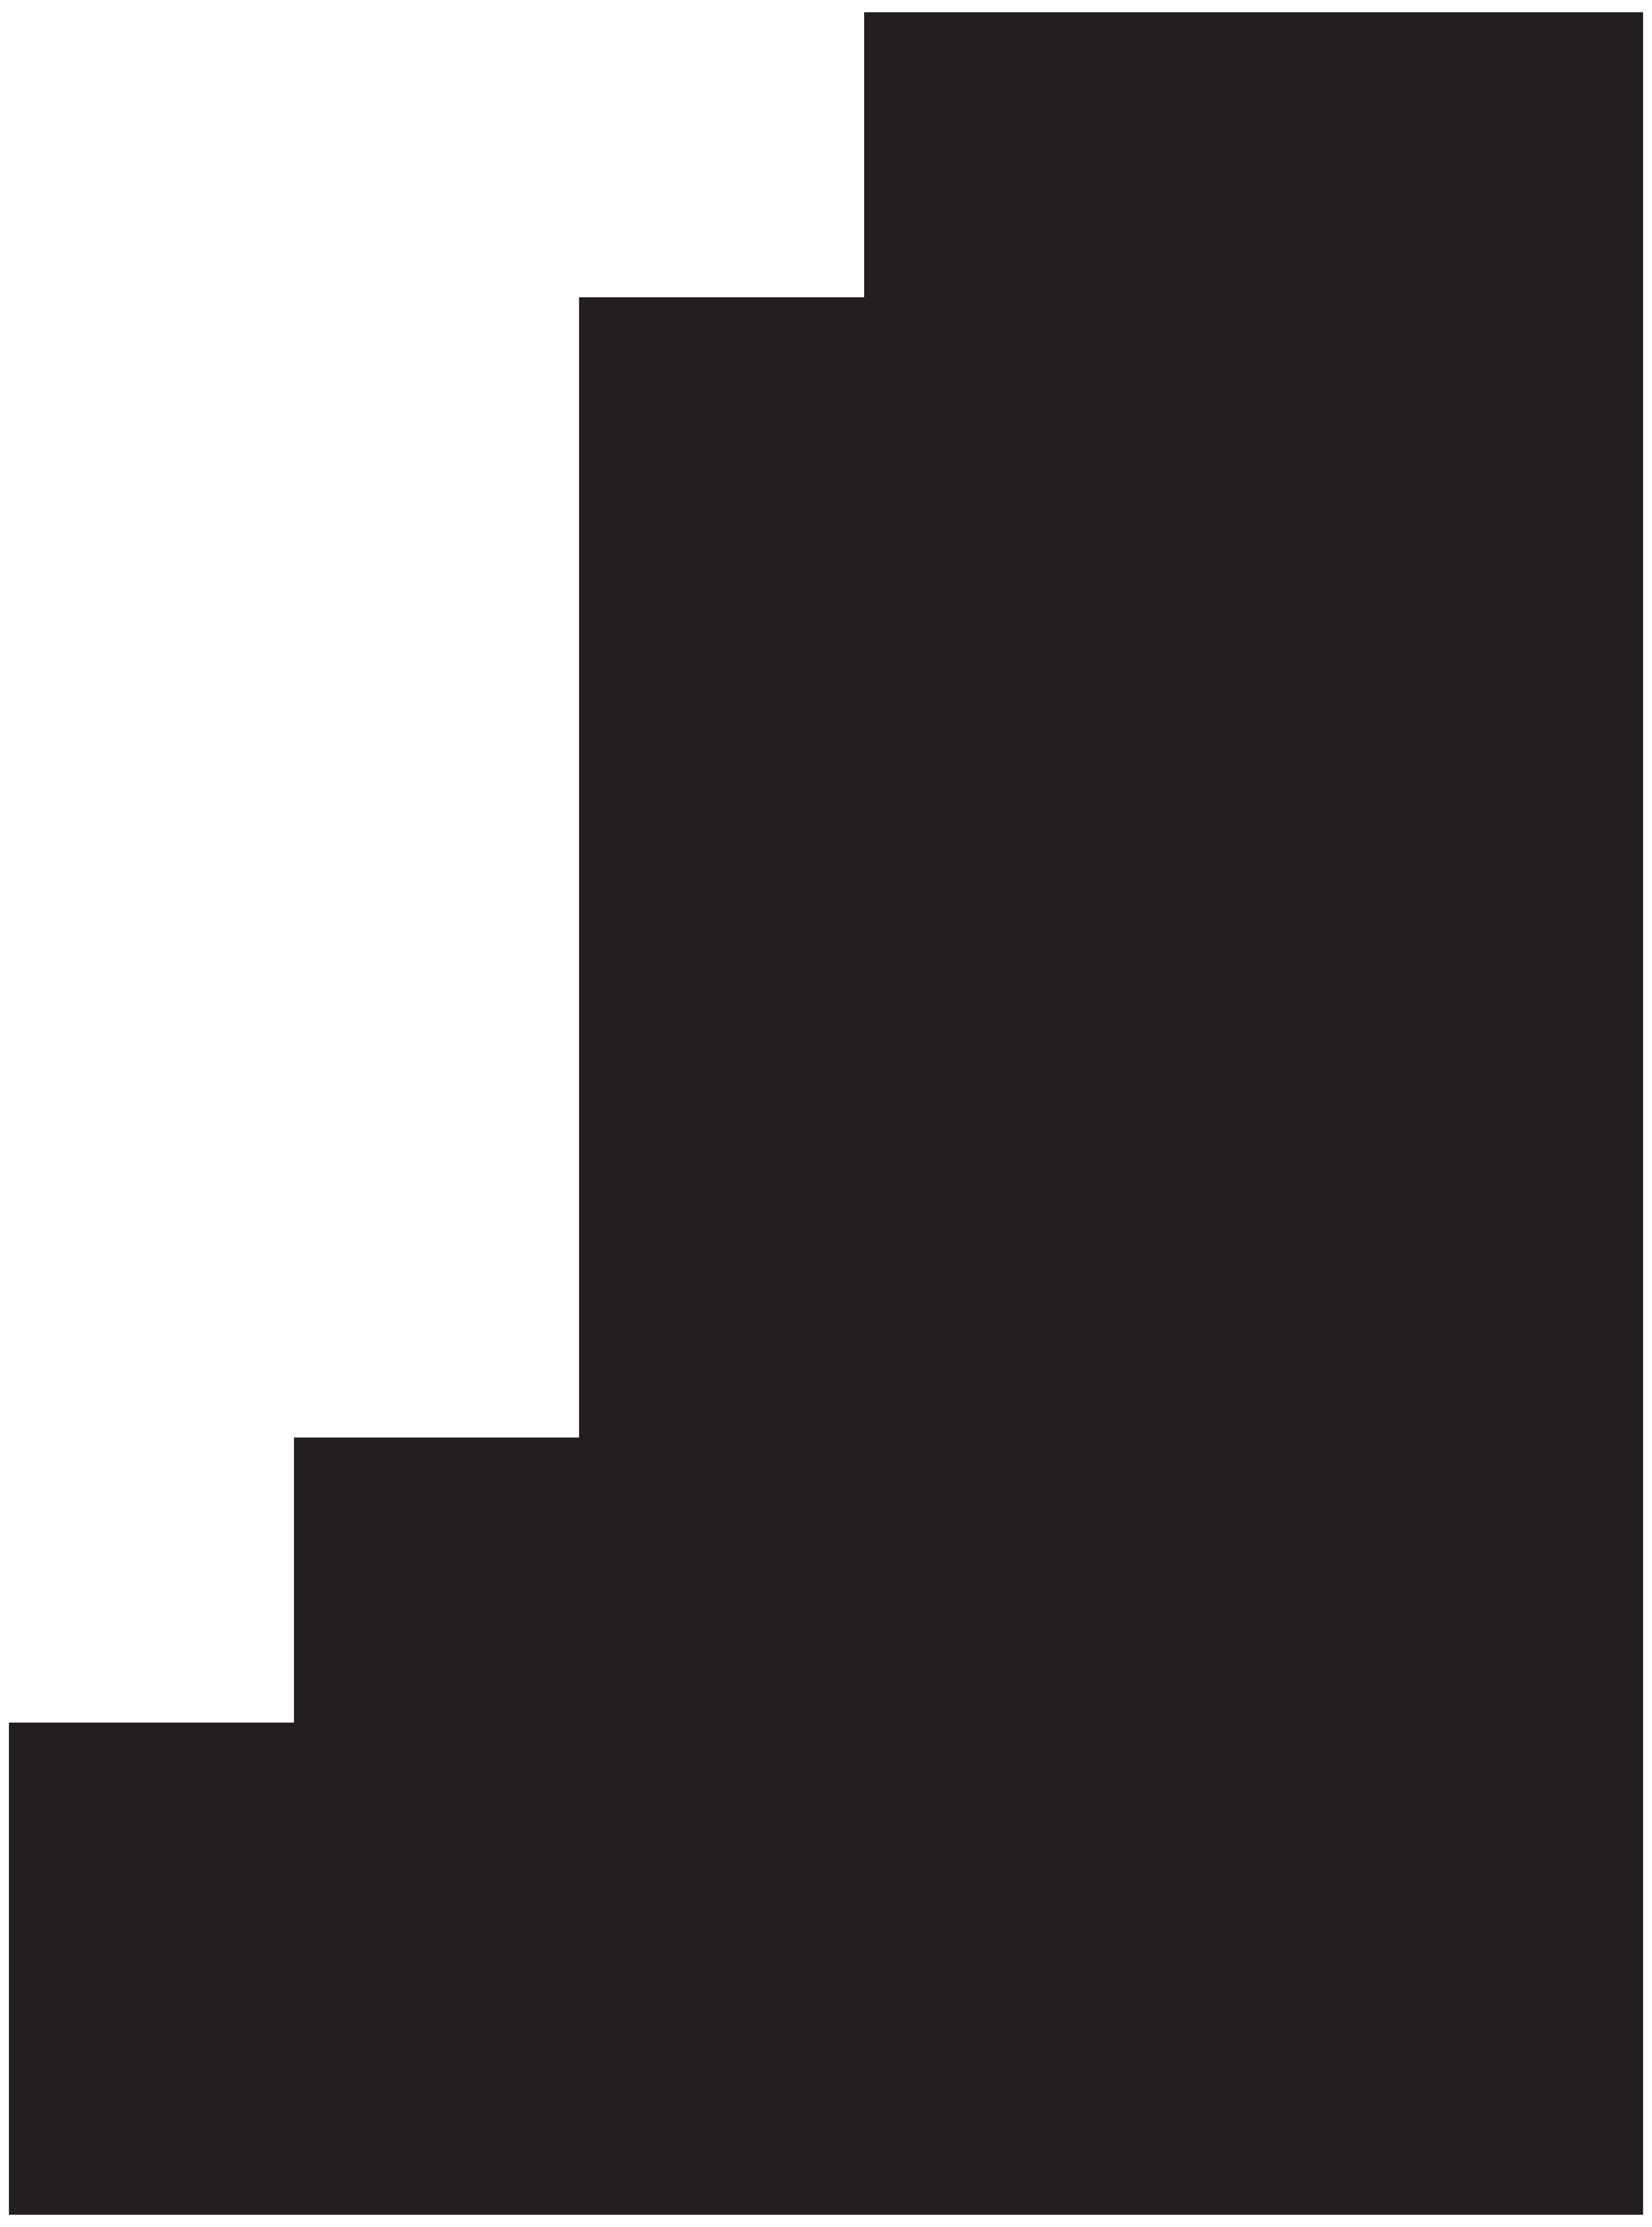 jpg free download Bride clipart. Silhouette at getdrawings com.